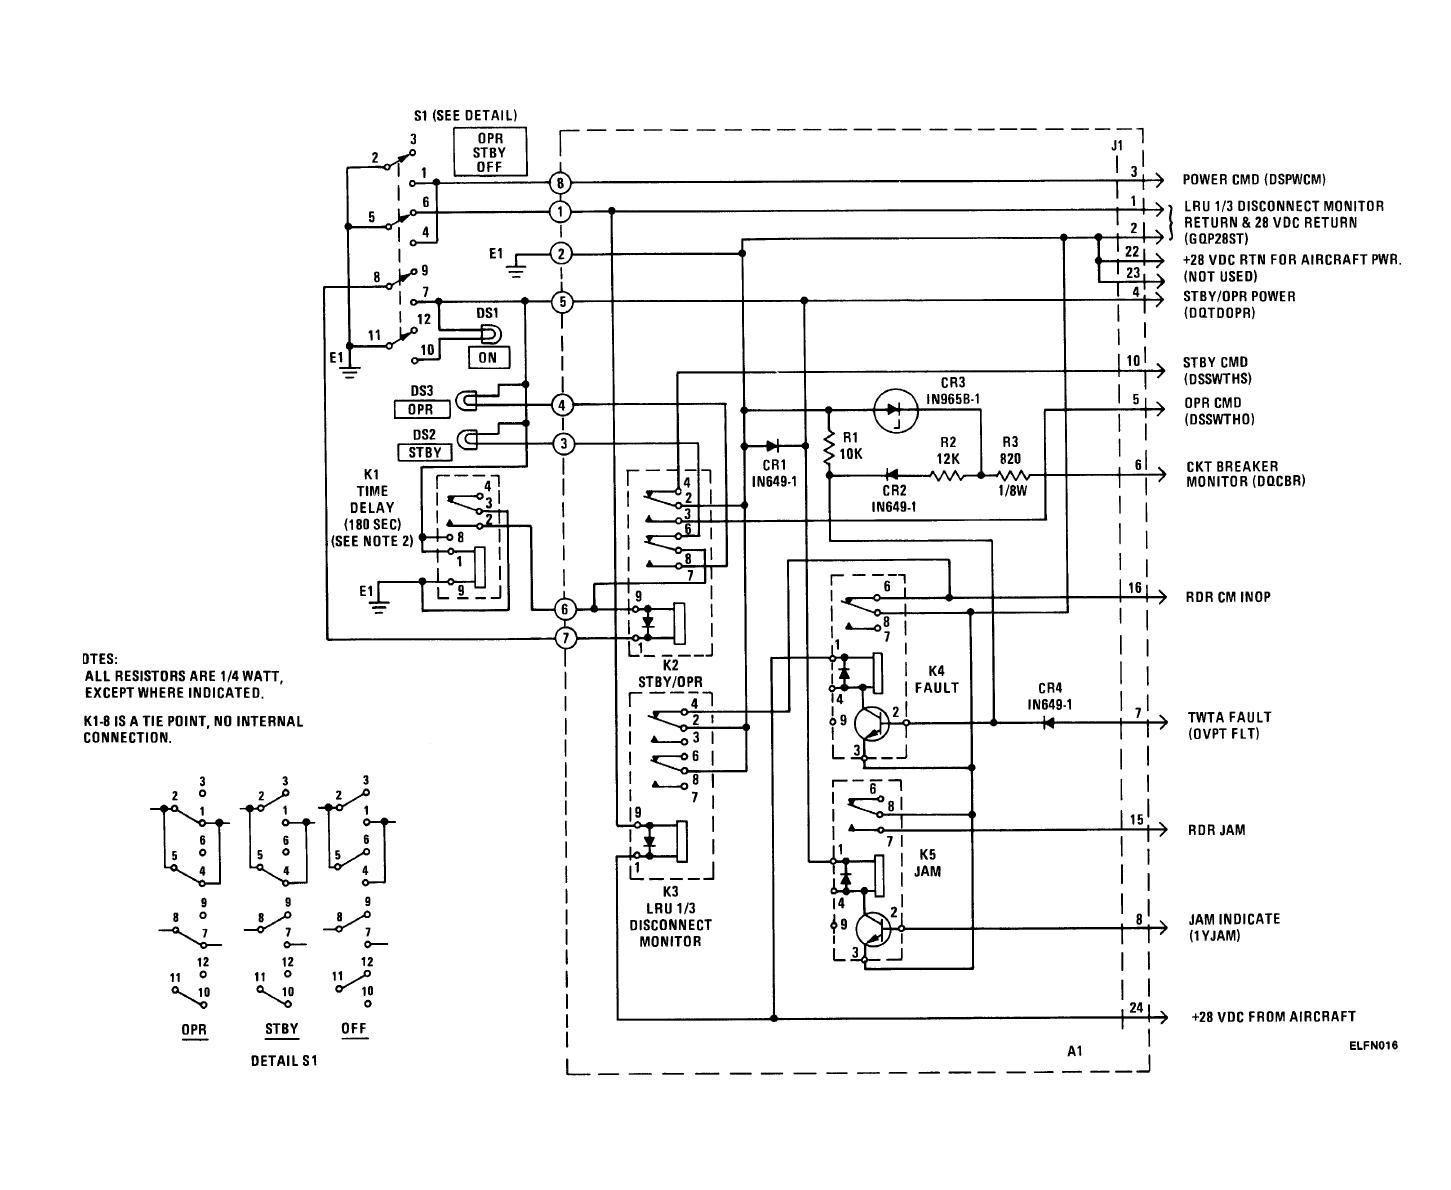 Figure FO-13 CONTROL INDICATOR 1A1A1 SCHEMATIC DIAGRAM